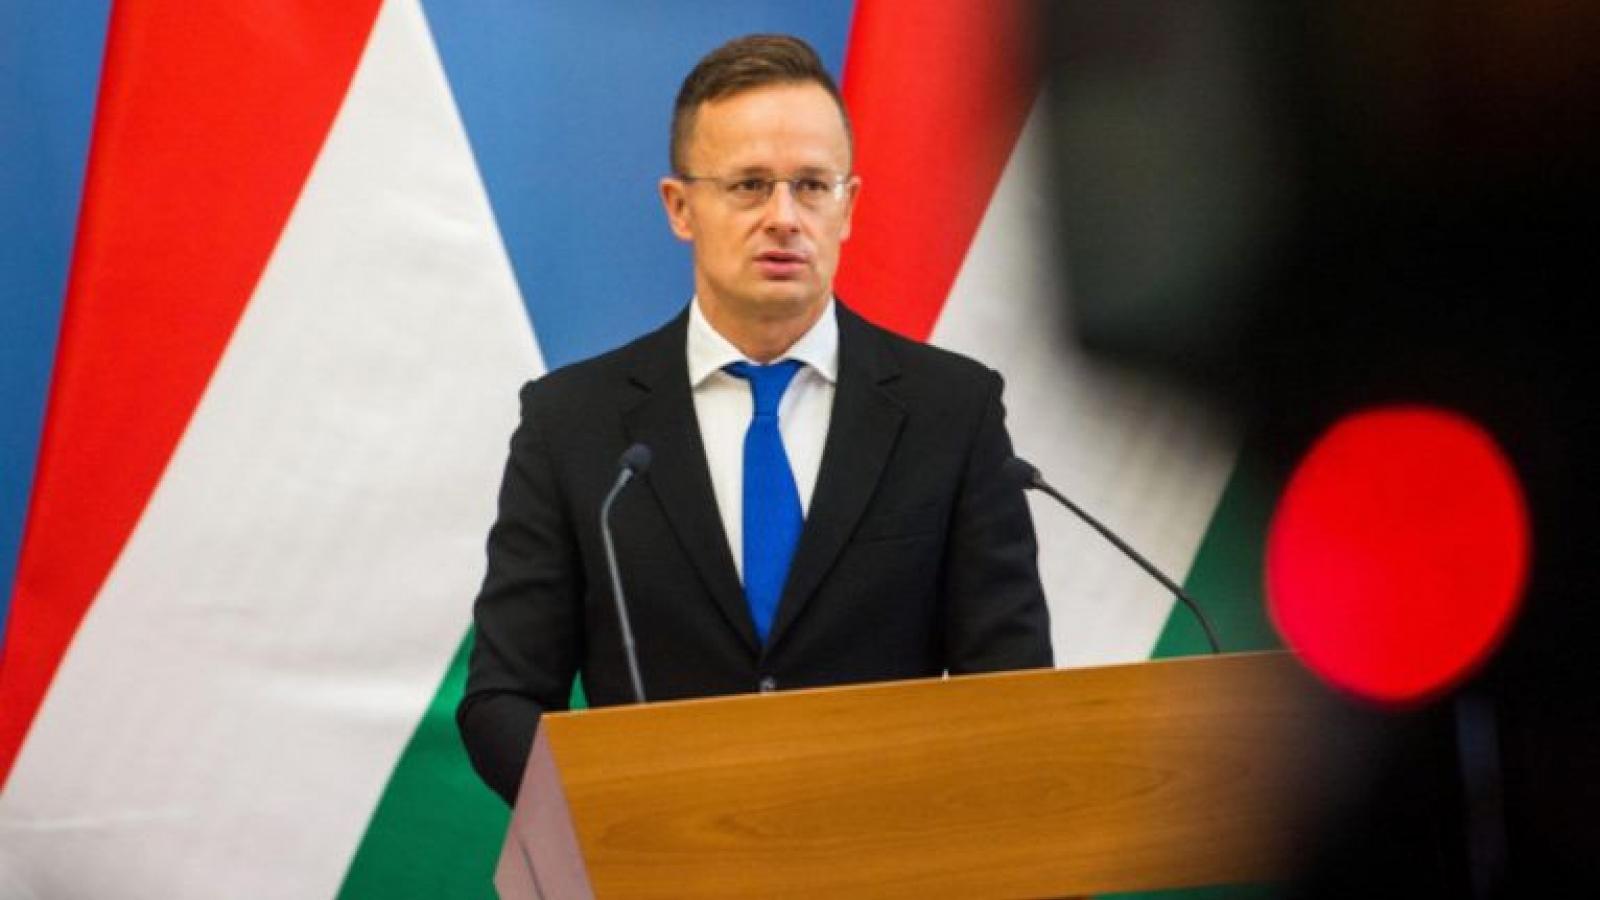 Hungarian Foreign Minister set for Vietnam visit on October 16